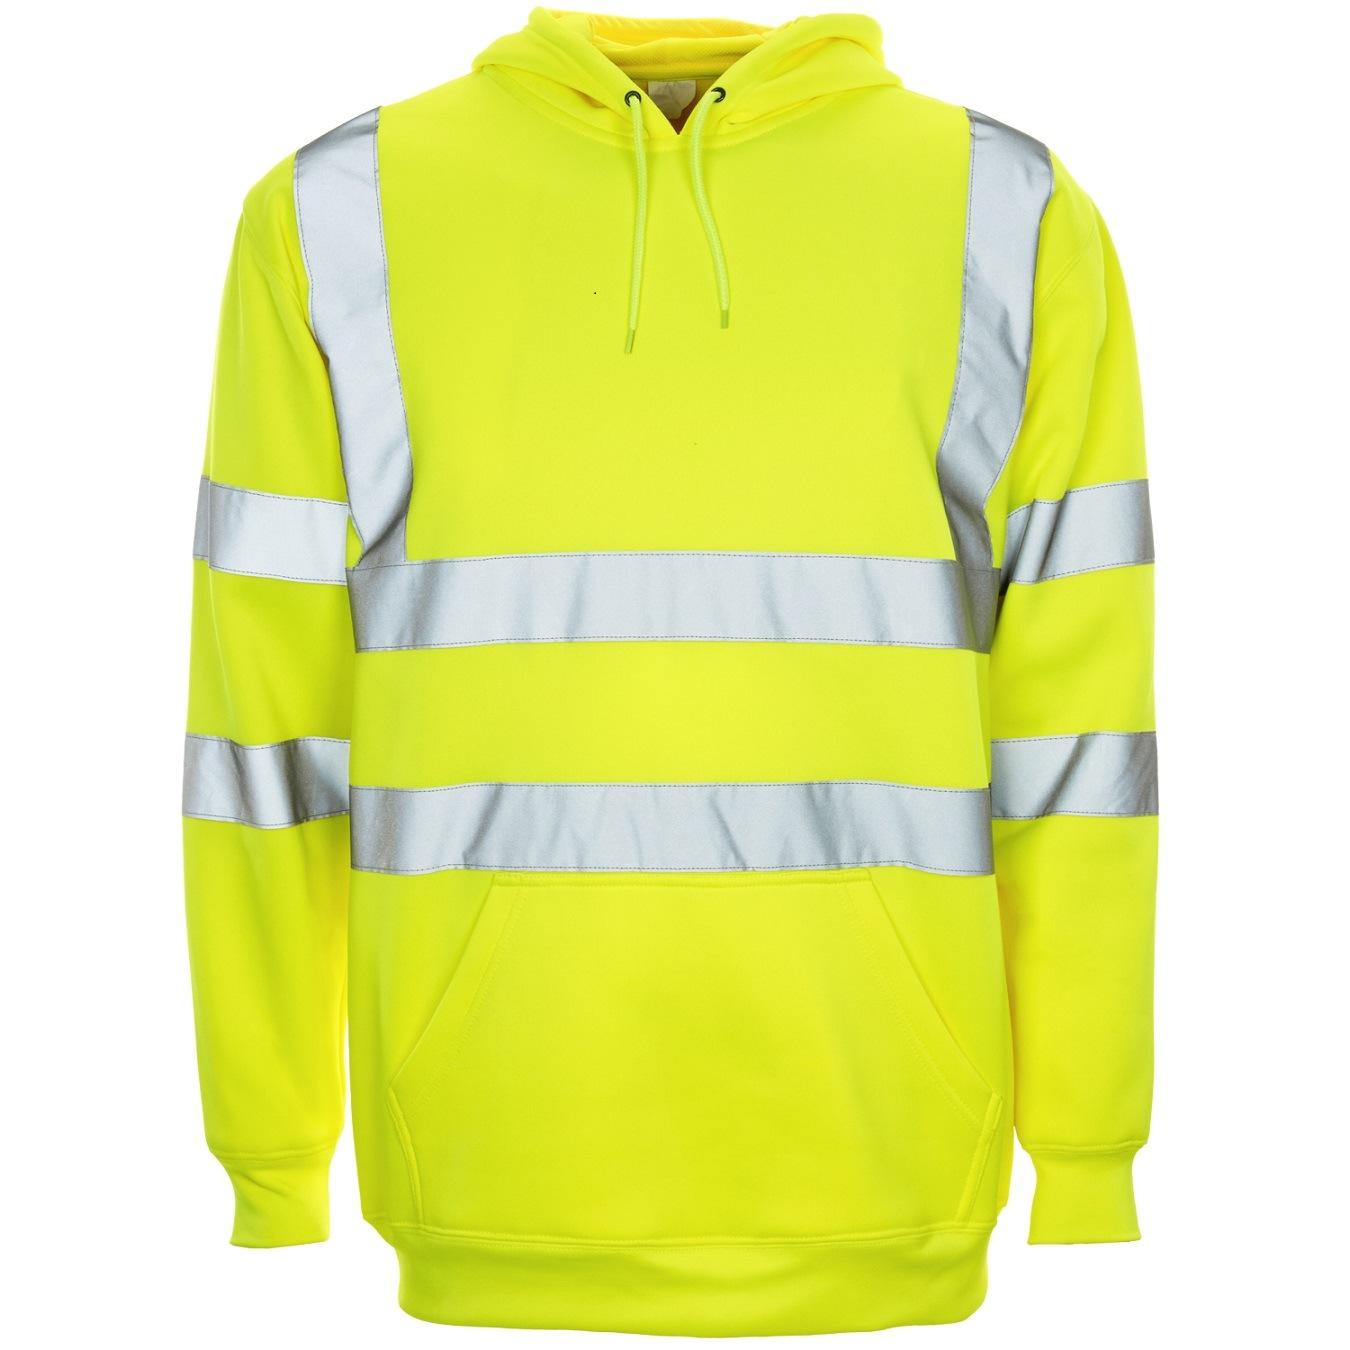 High Reflective Fleece Jacket for Workwear with En20471 (C2495)